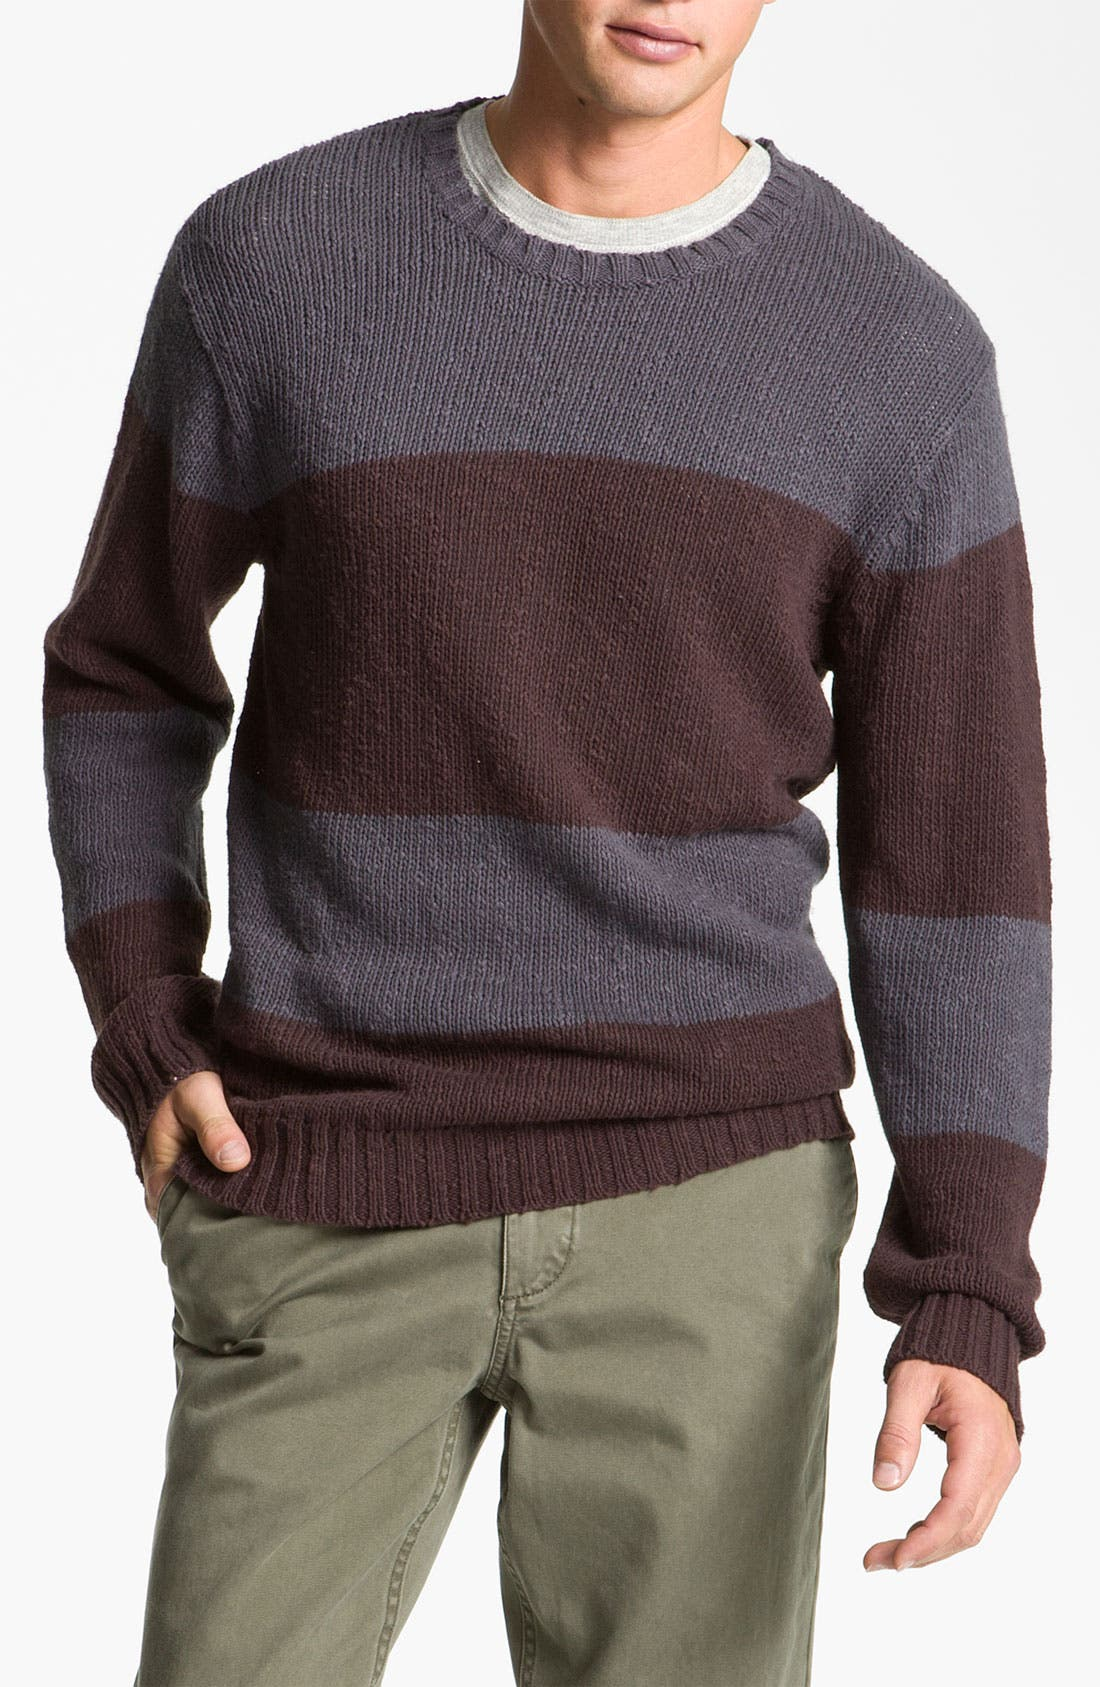 Alternate Image 1 Selected - VSTR 'Saltie' Stripe Crewneck Sweater